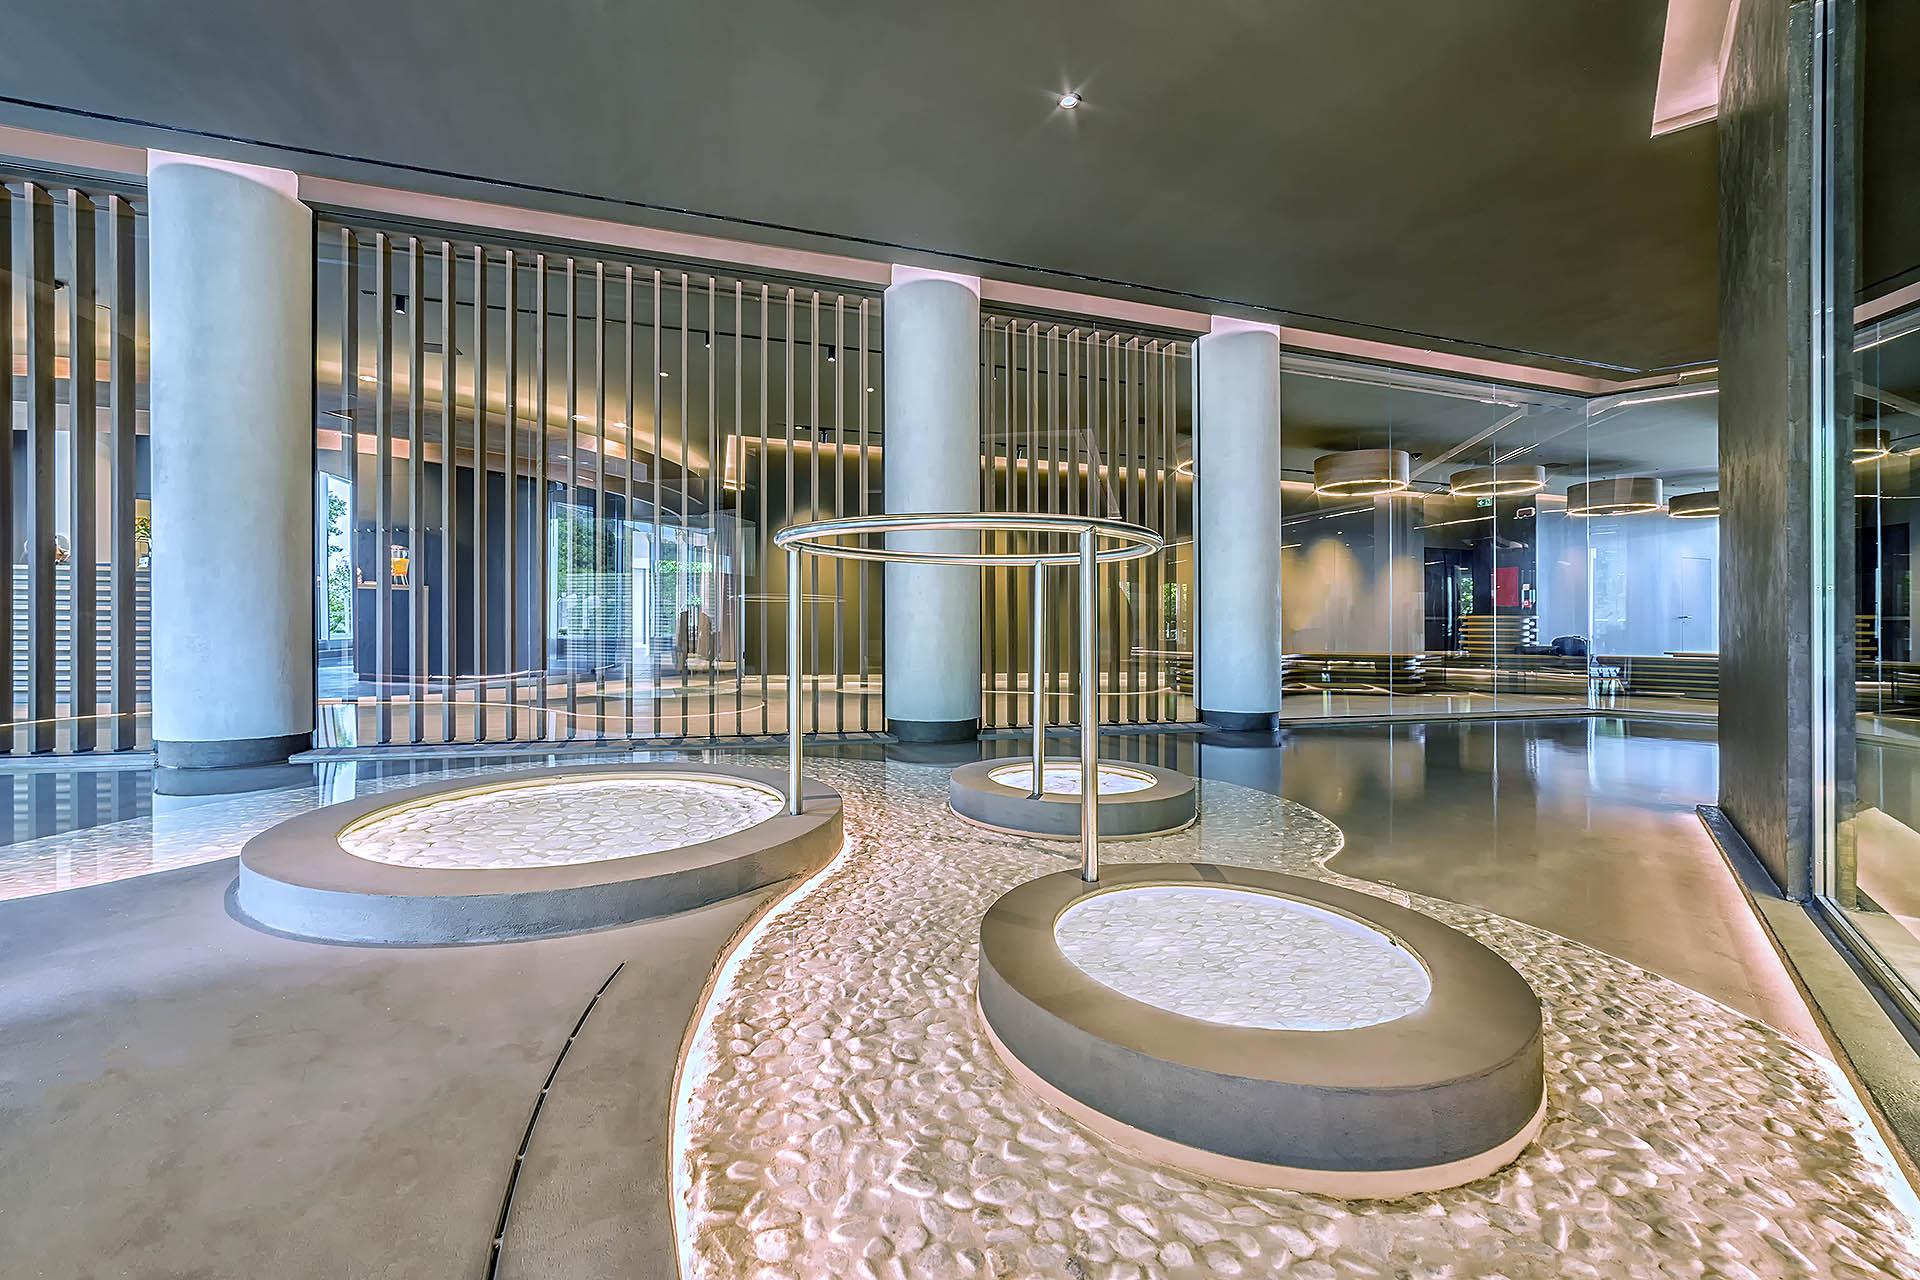 KNEIPP <br> HOTEL TERME PREISTORICHE - MONTEGROTTO TERME (PD)